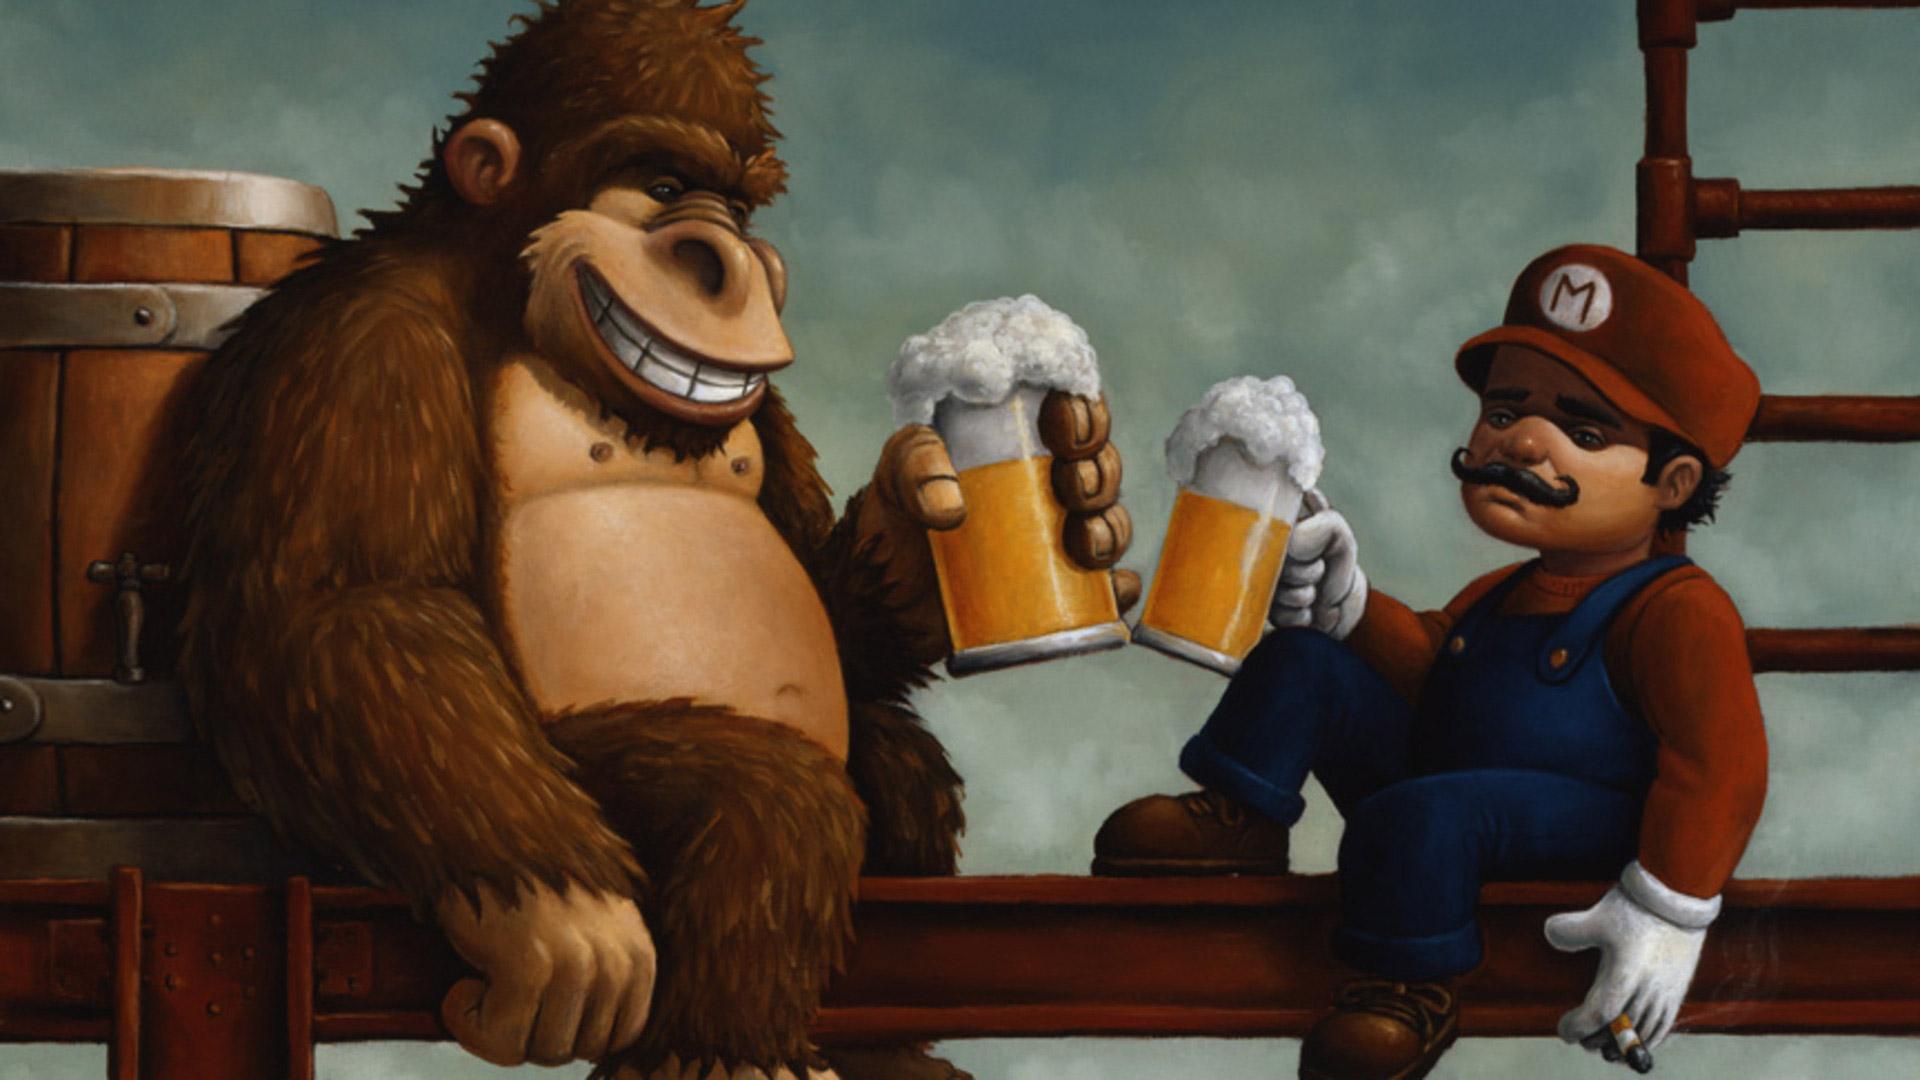 Cool Wallpaper Home Screen Donkey Kong - wallpaper-donkey-kong-chill-1920x1080  Pic_549314.jpg